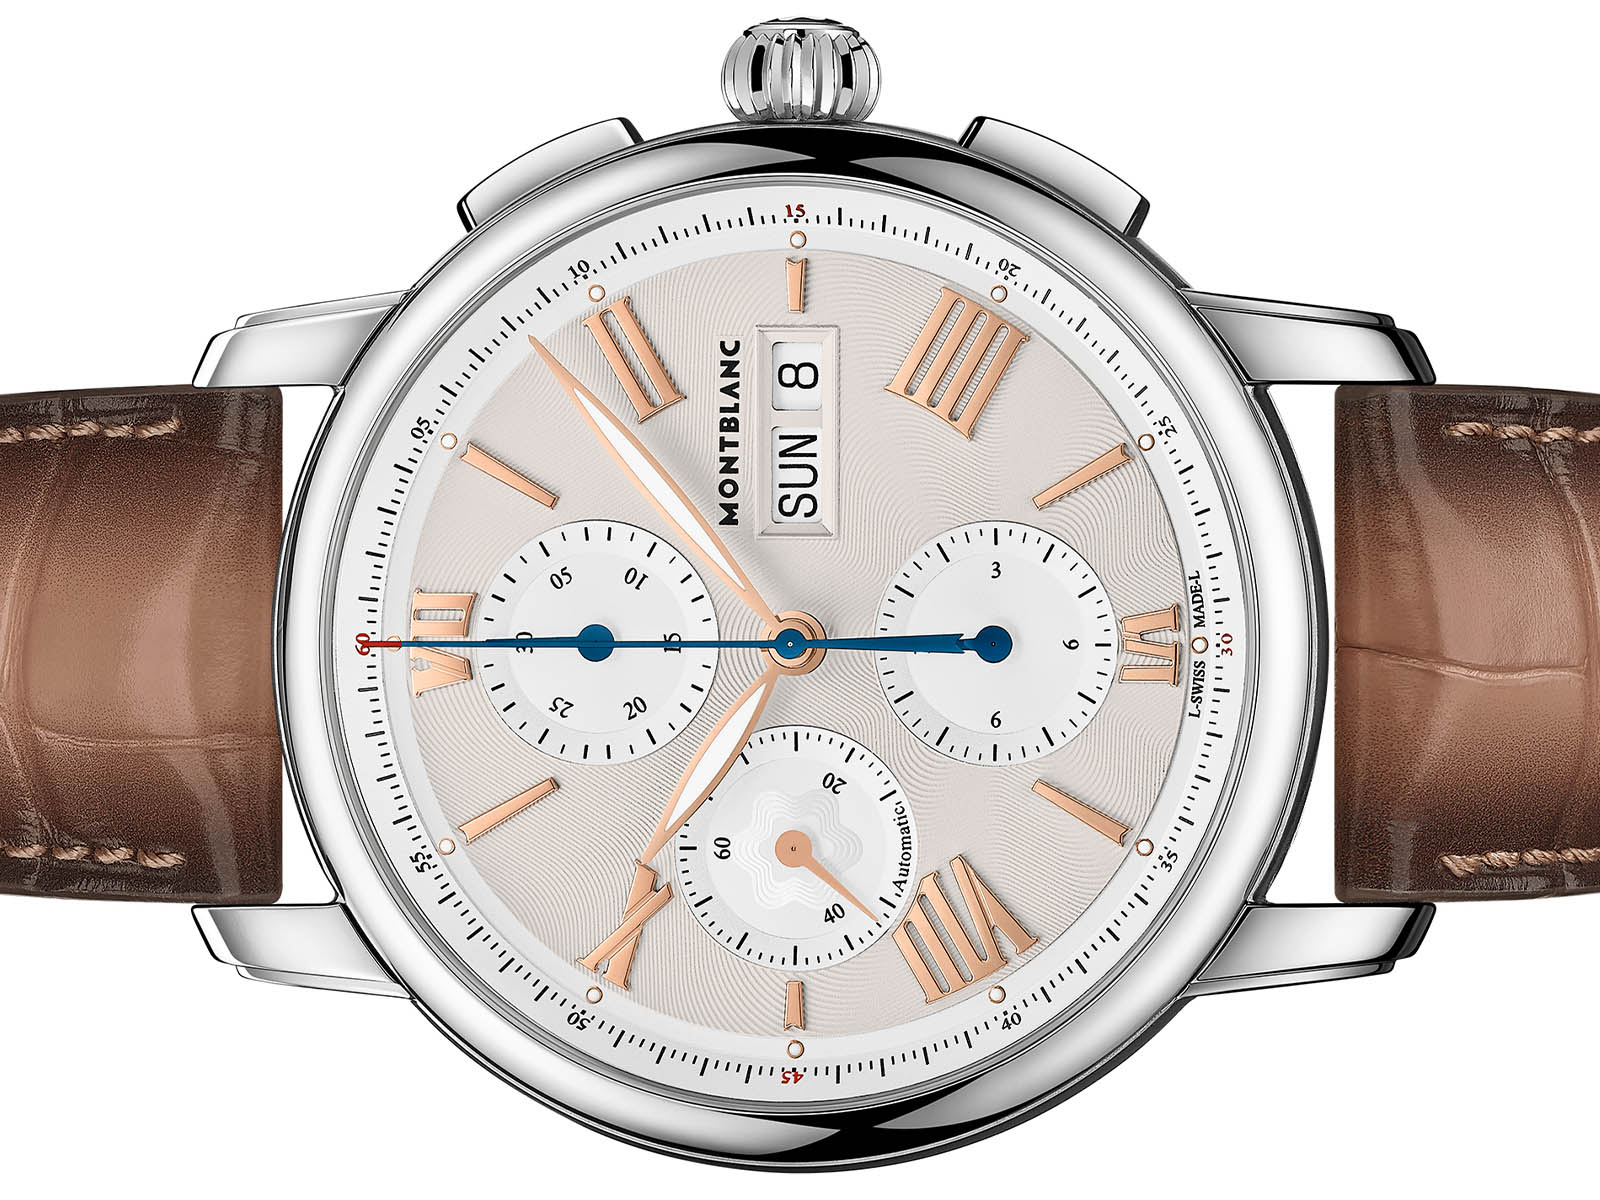 126080-montblanc-star-legacy-chronograph-day-date-2.jpg